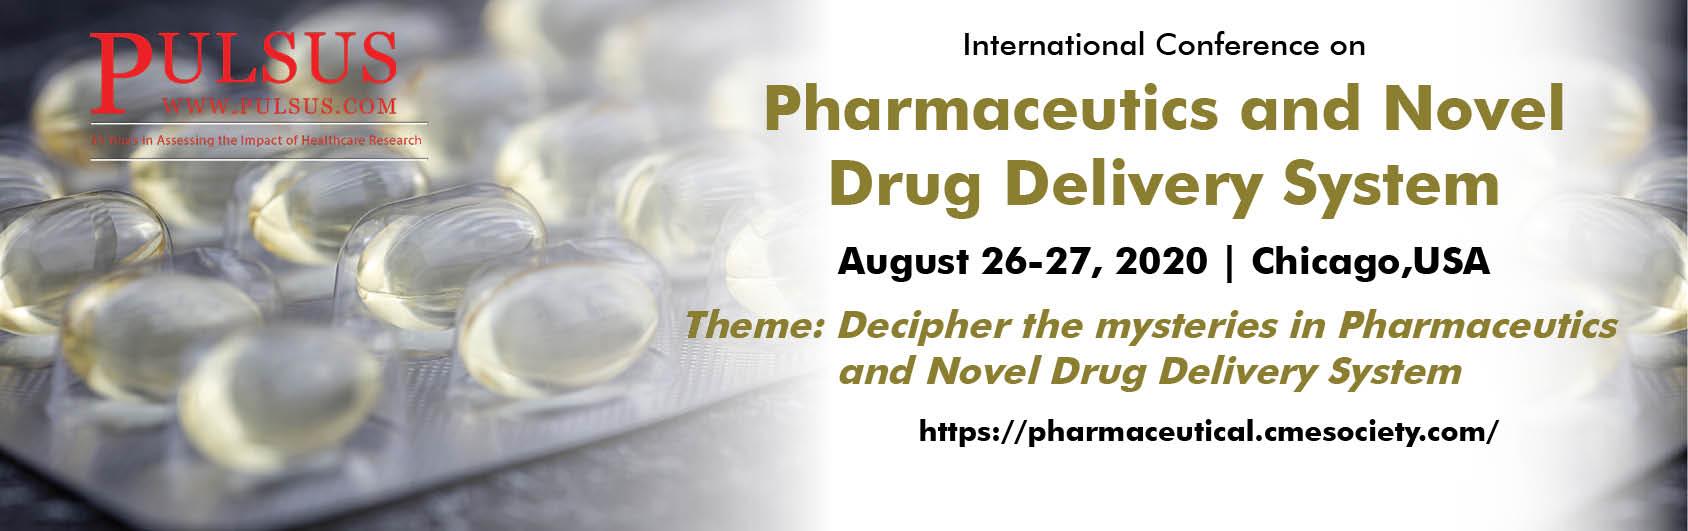 International Conference on Pharmaceutics and Novel Drug Delivery System, Chicago, Illinois, United States